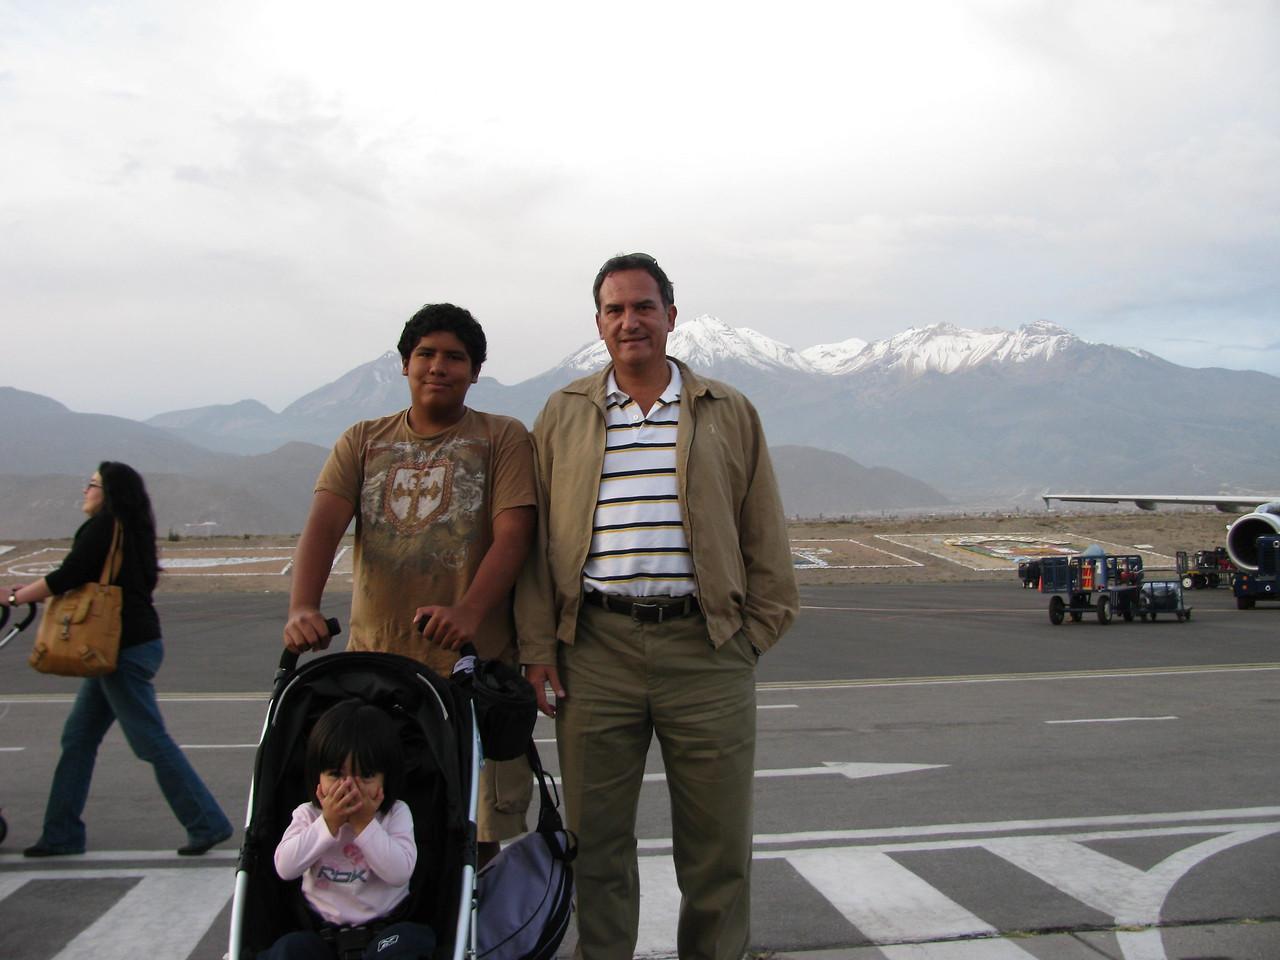 Arrivando en Arequipa.<br /> <br /> Arriving in Arequipa.